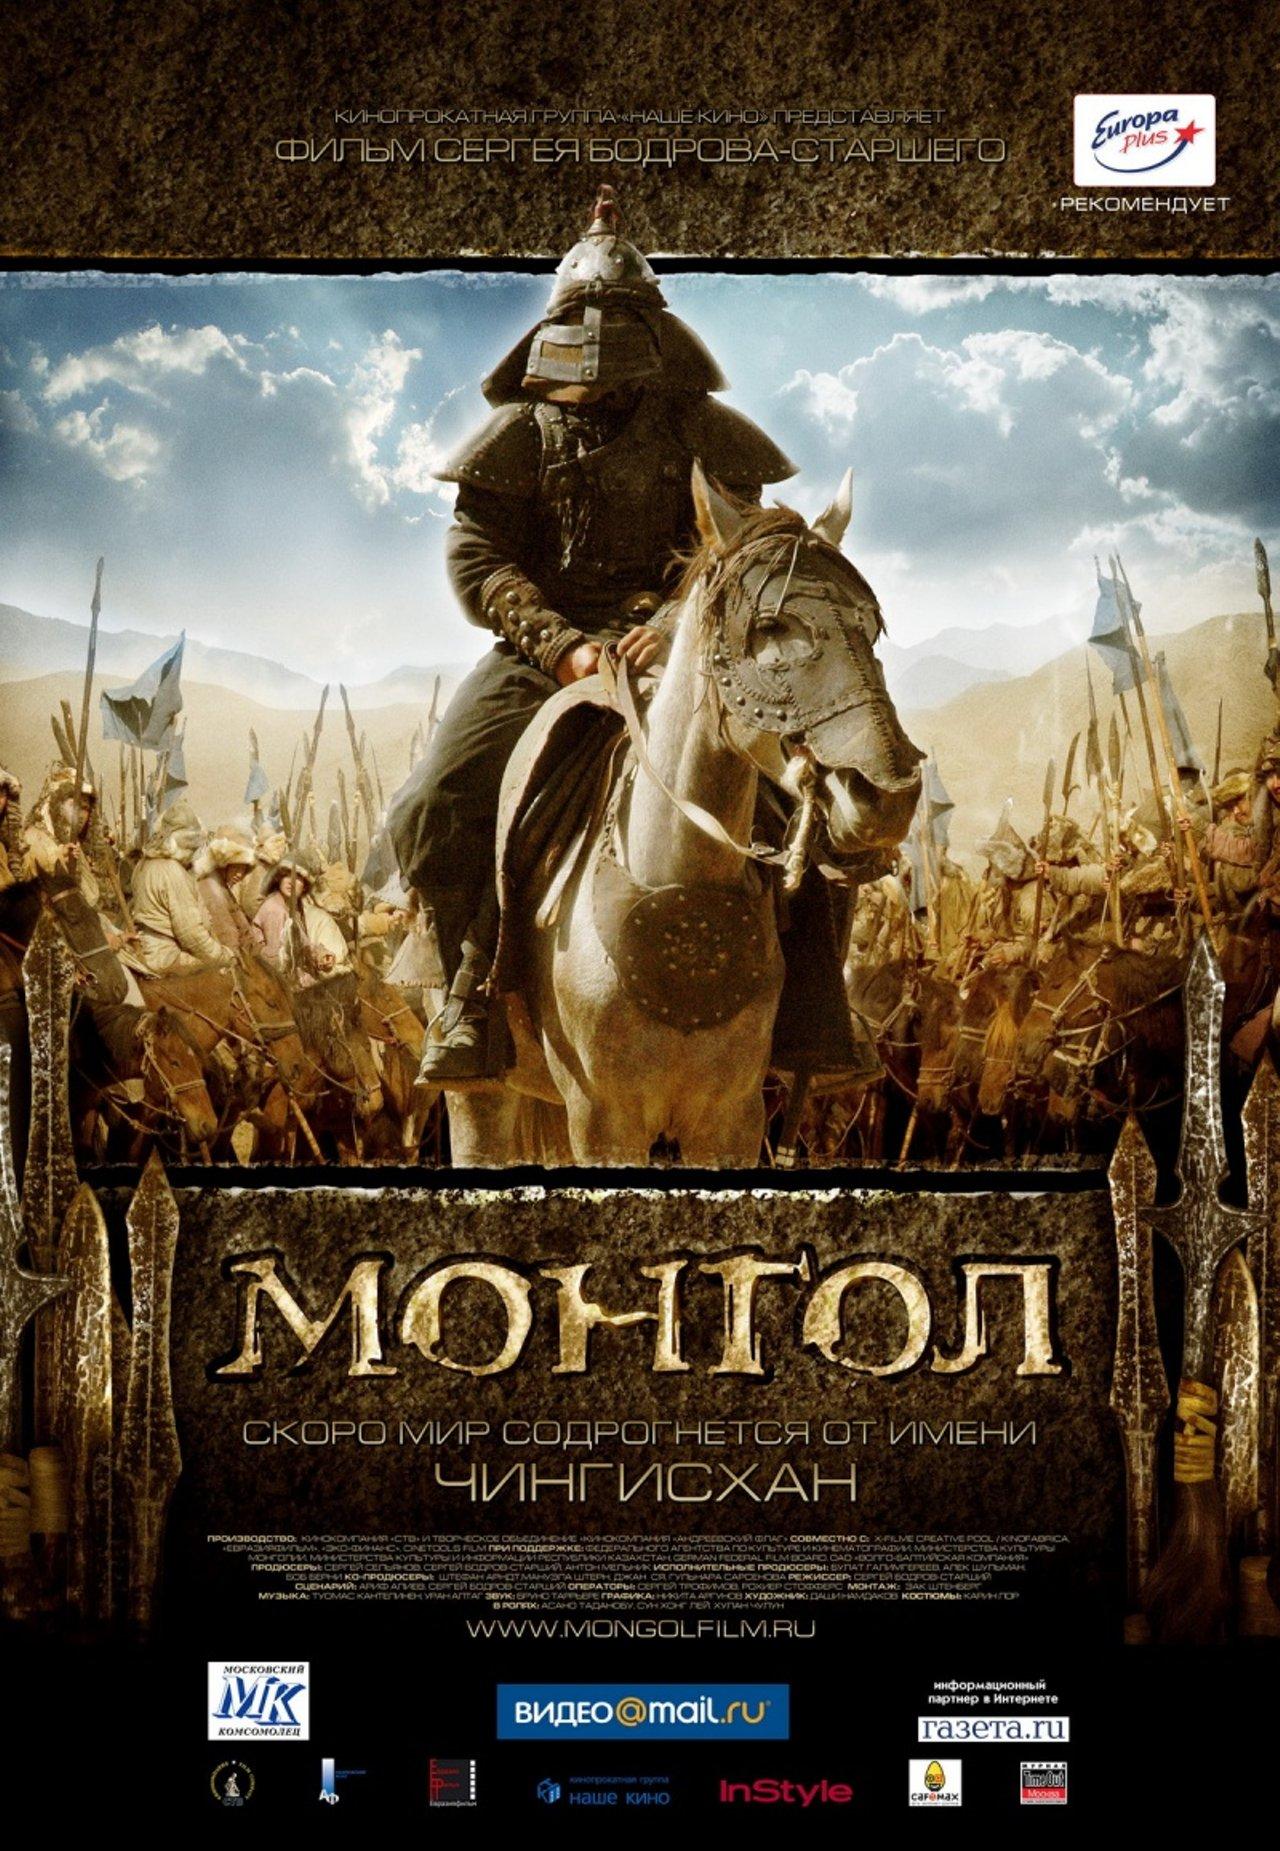 Ютуб эротика монгол 2 фотография